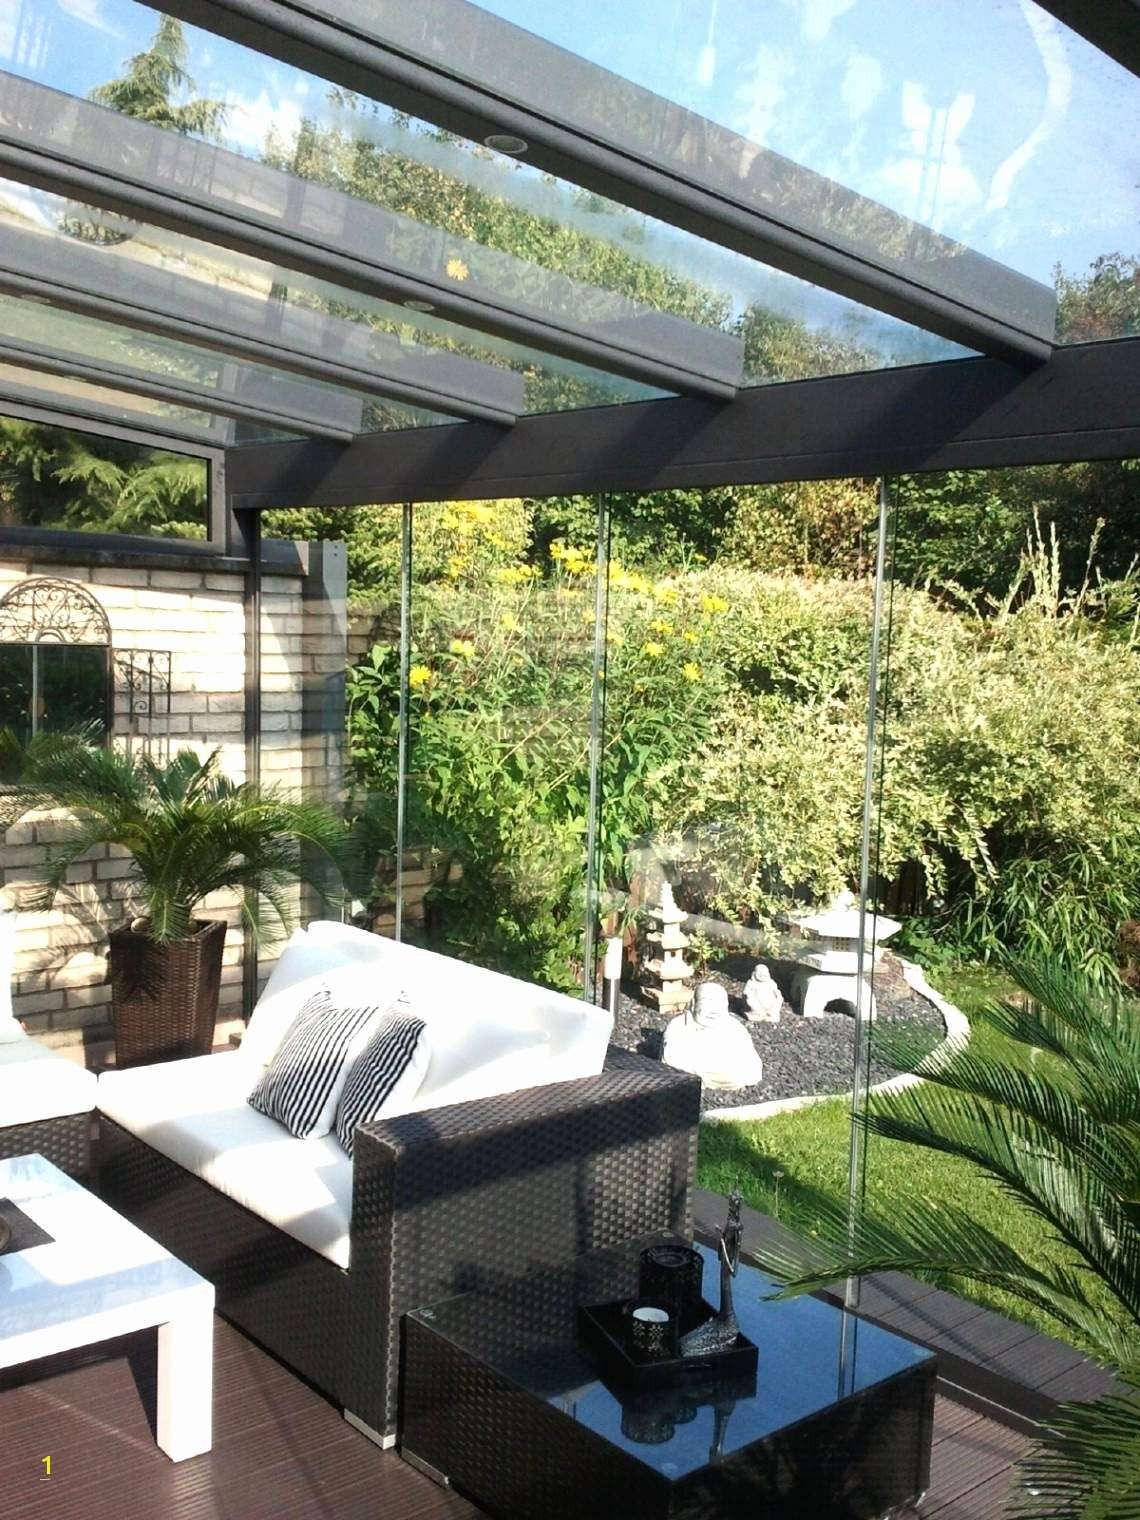 Design 43 Zum Hochbeet Uberdachung Selber Bauen Terassenideen Moderner Hinterhof Terrasse Dekorieren